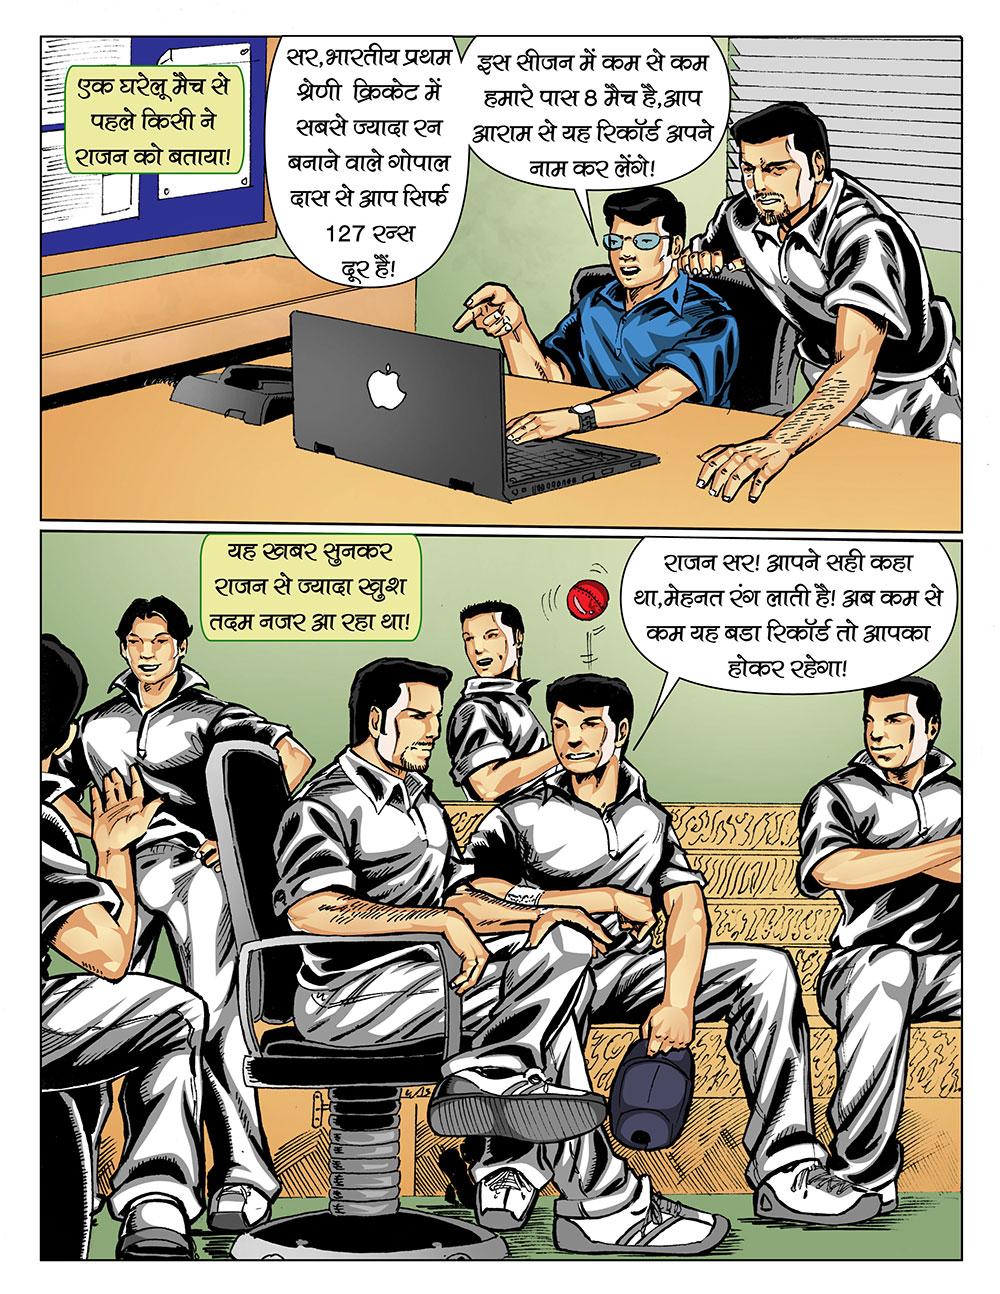 freelance talent